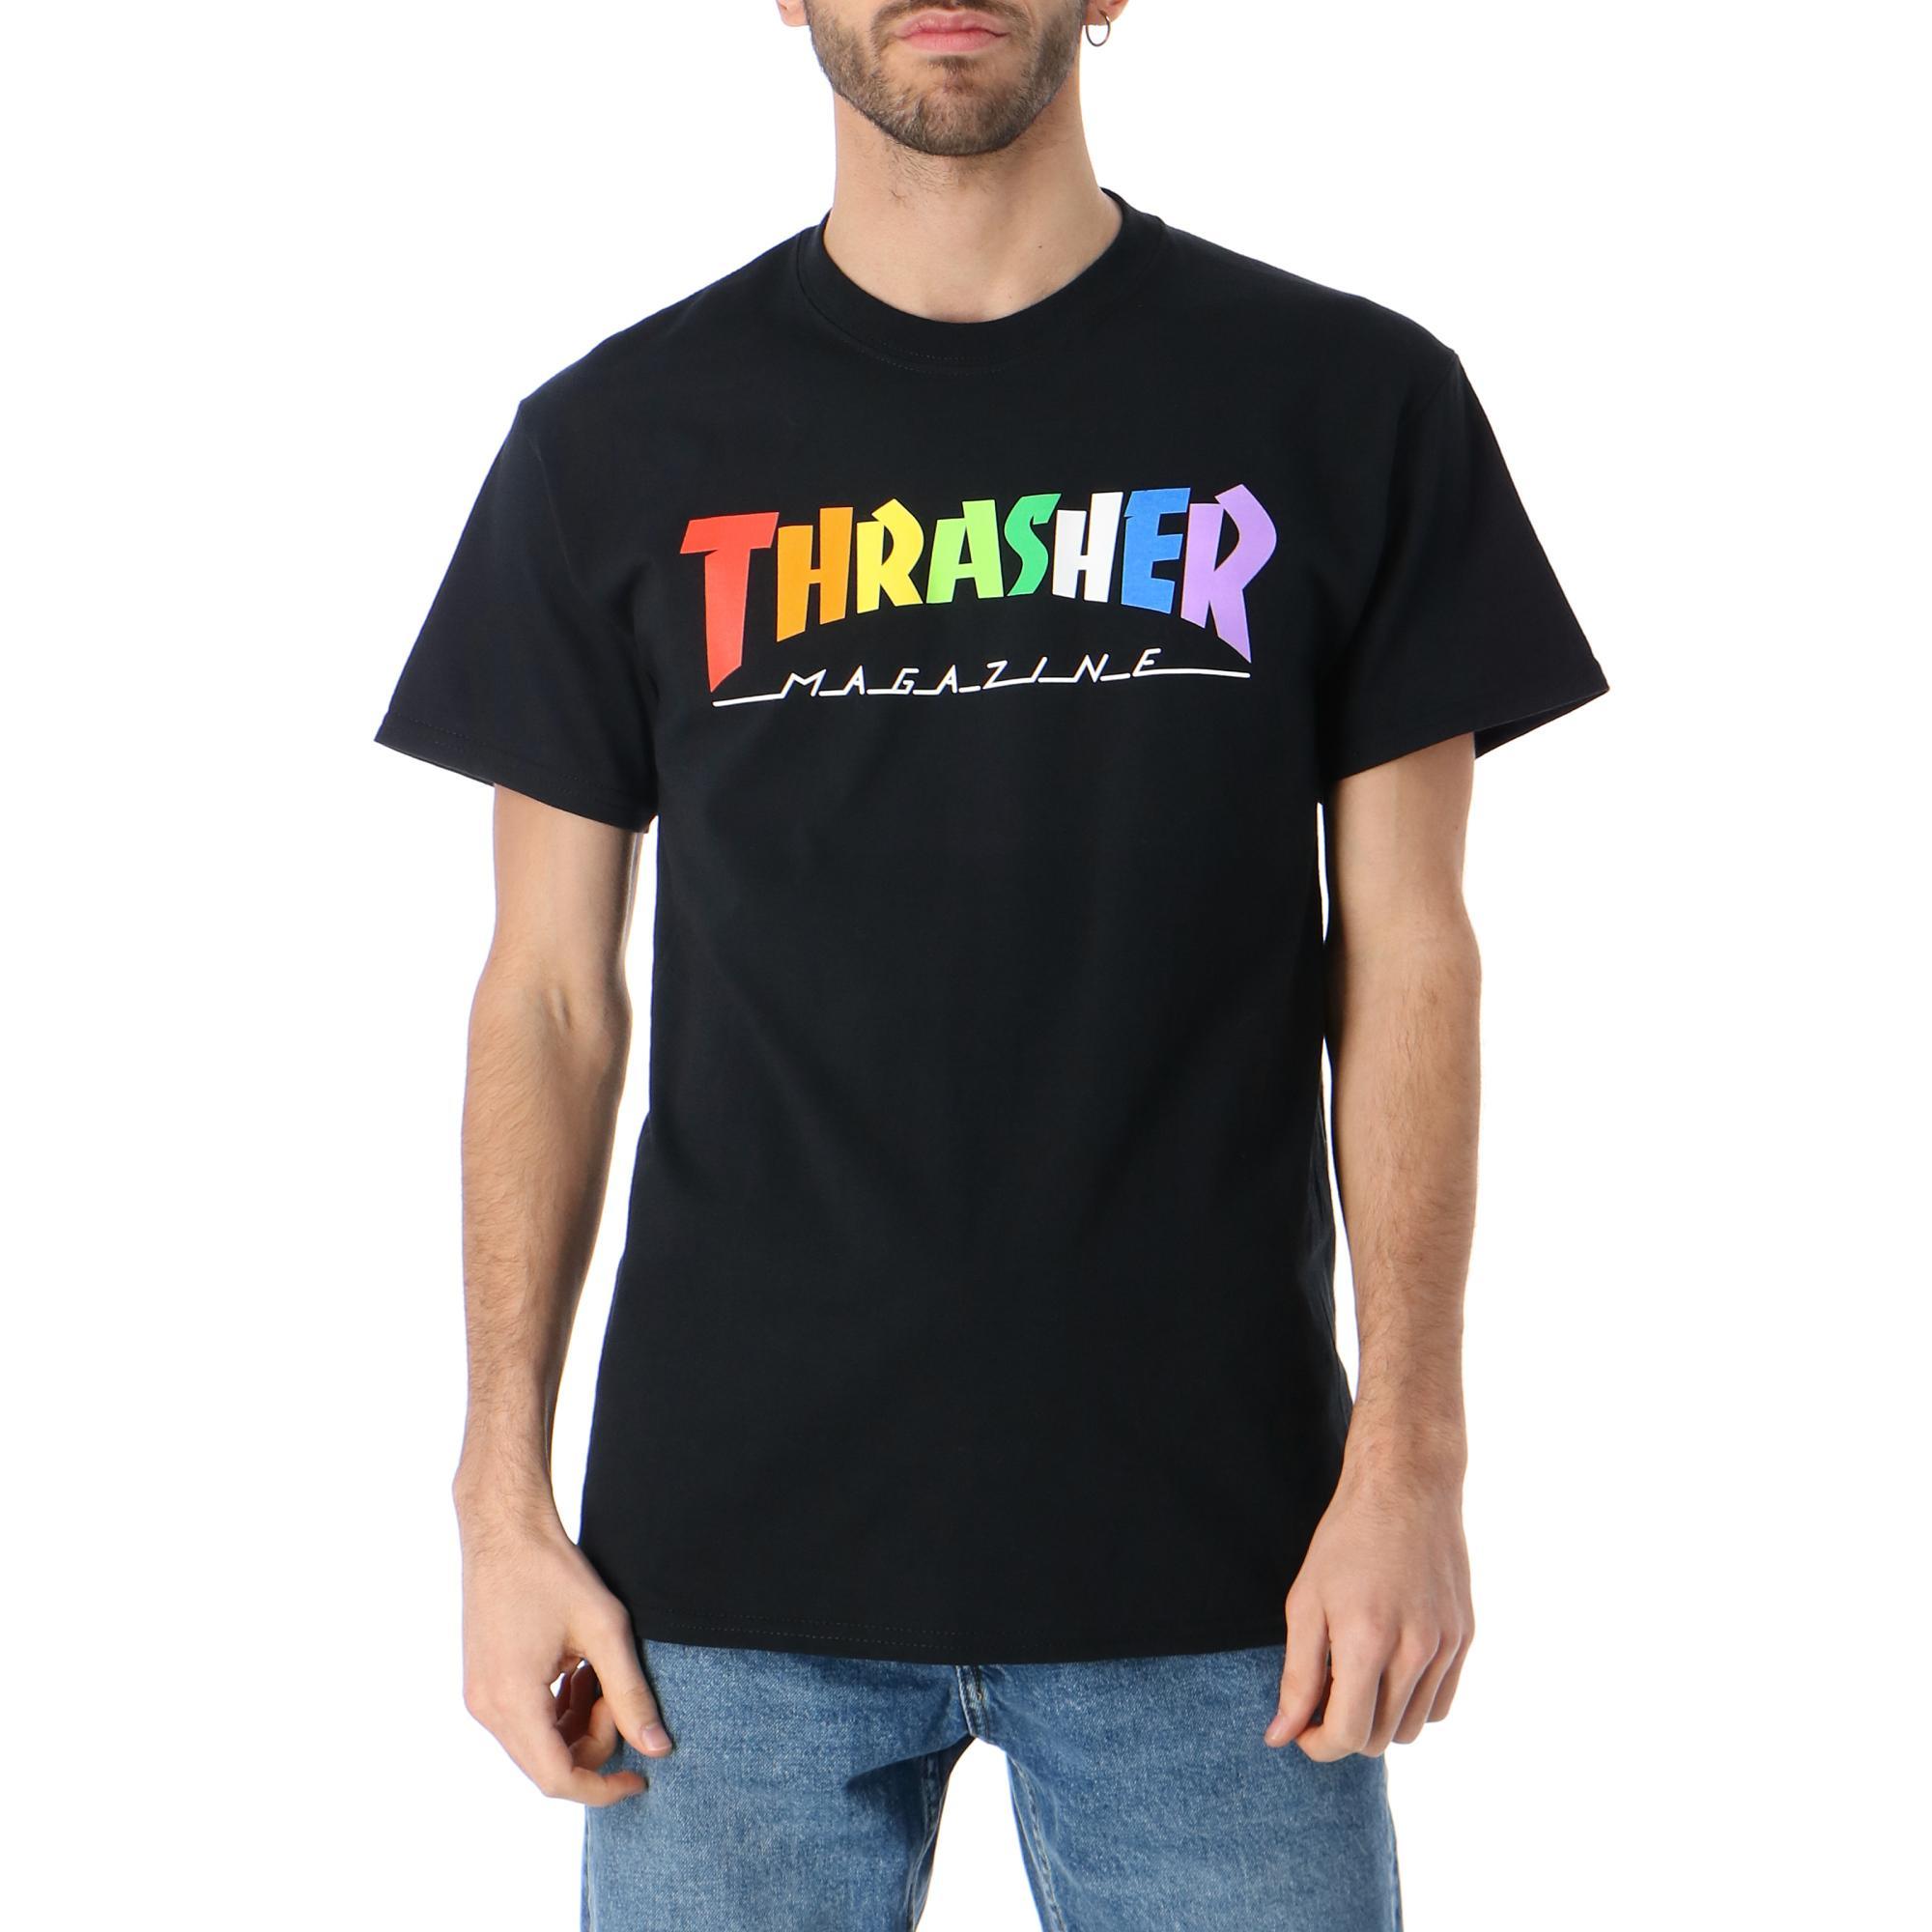 Thrasher Rainbow Mag S/s Black